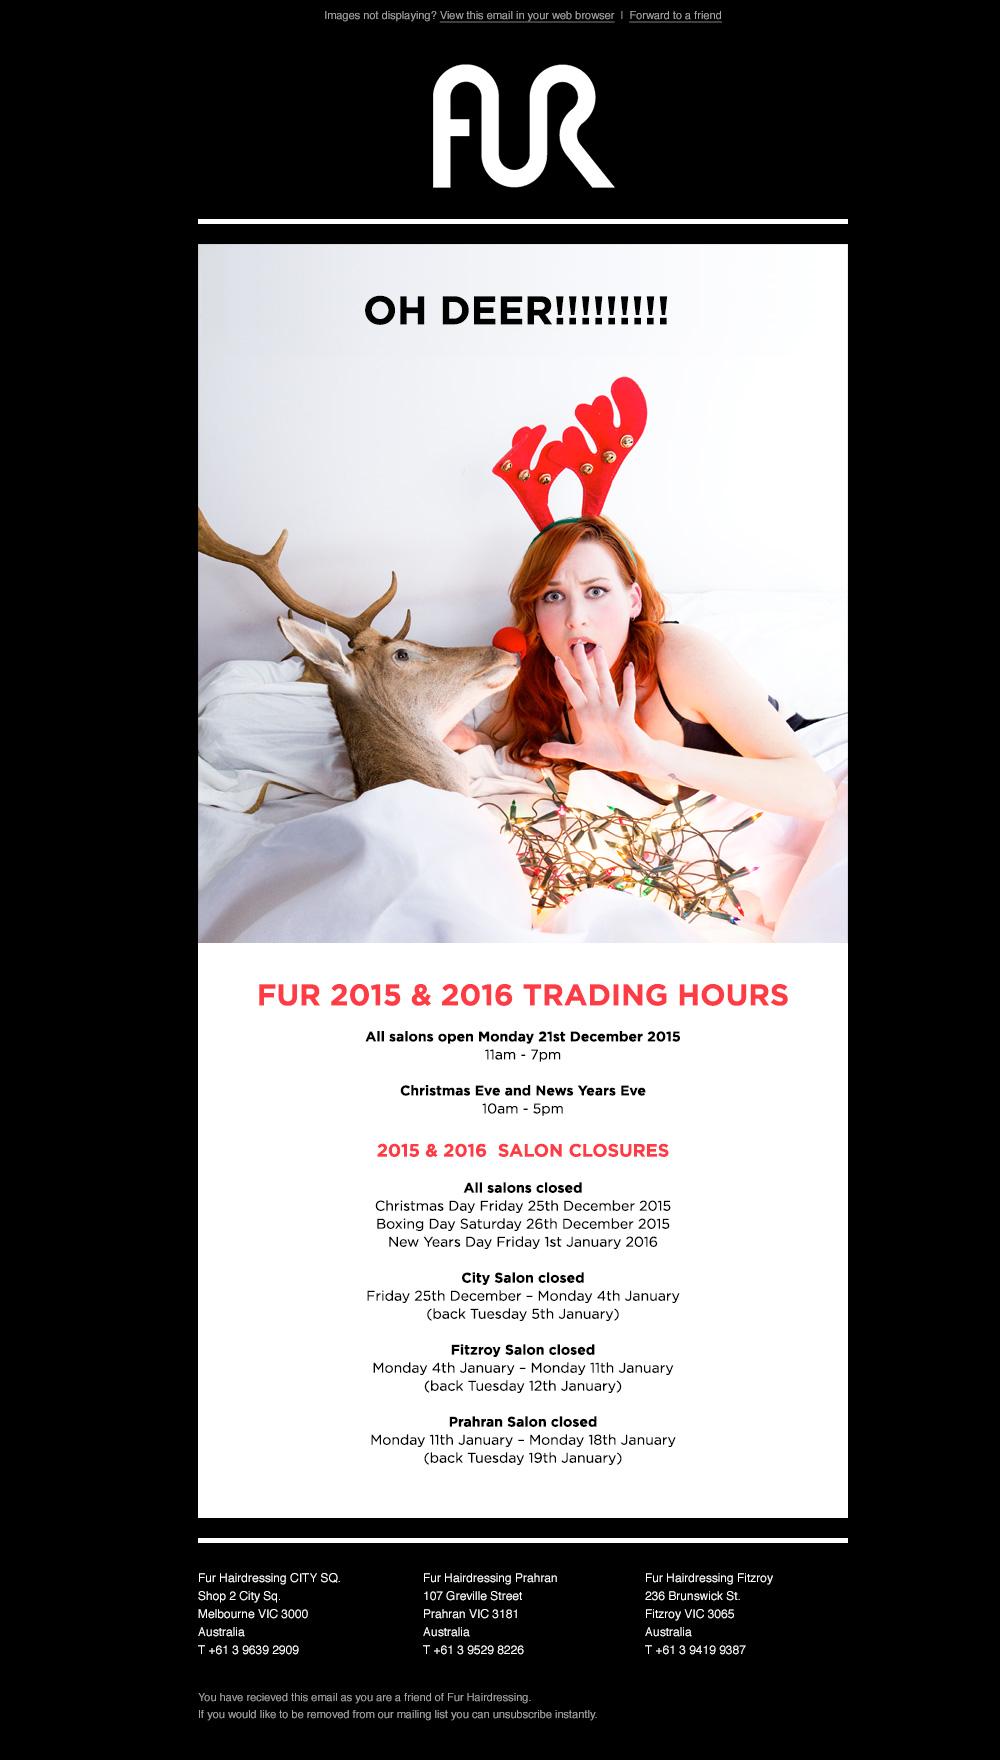 fur-xmas-2015-email-v02